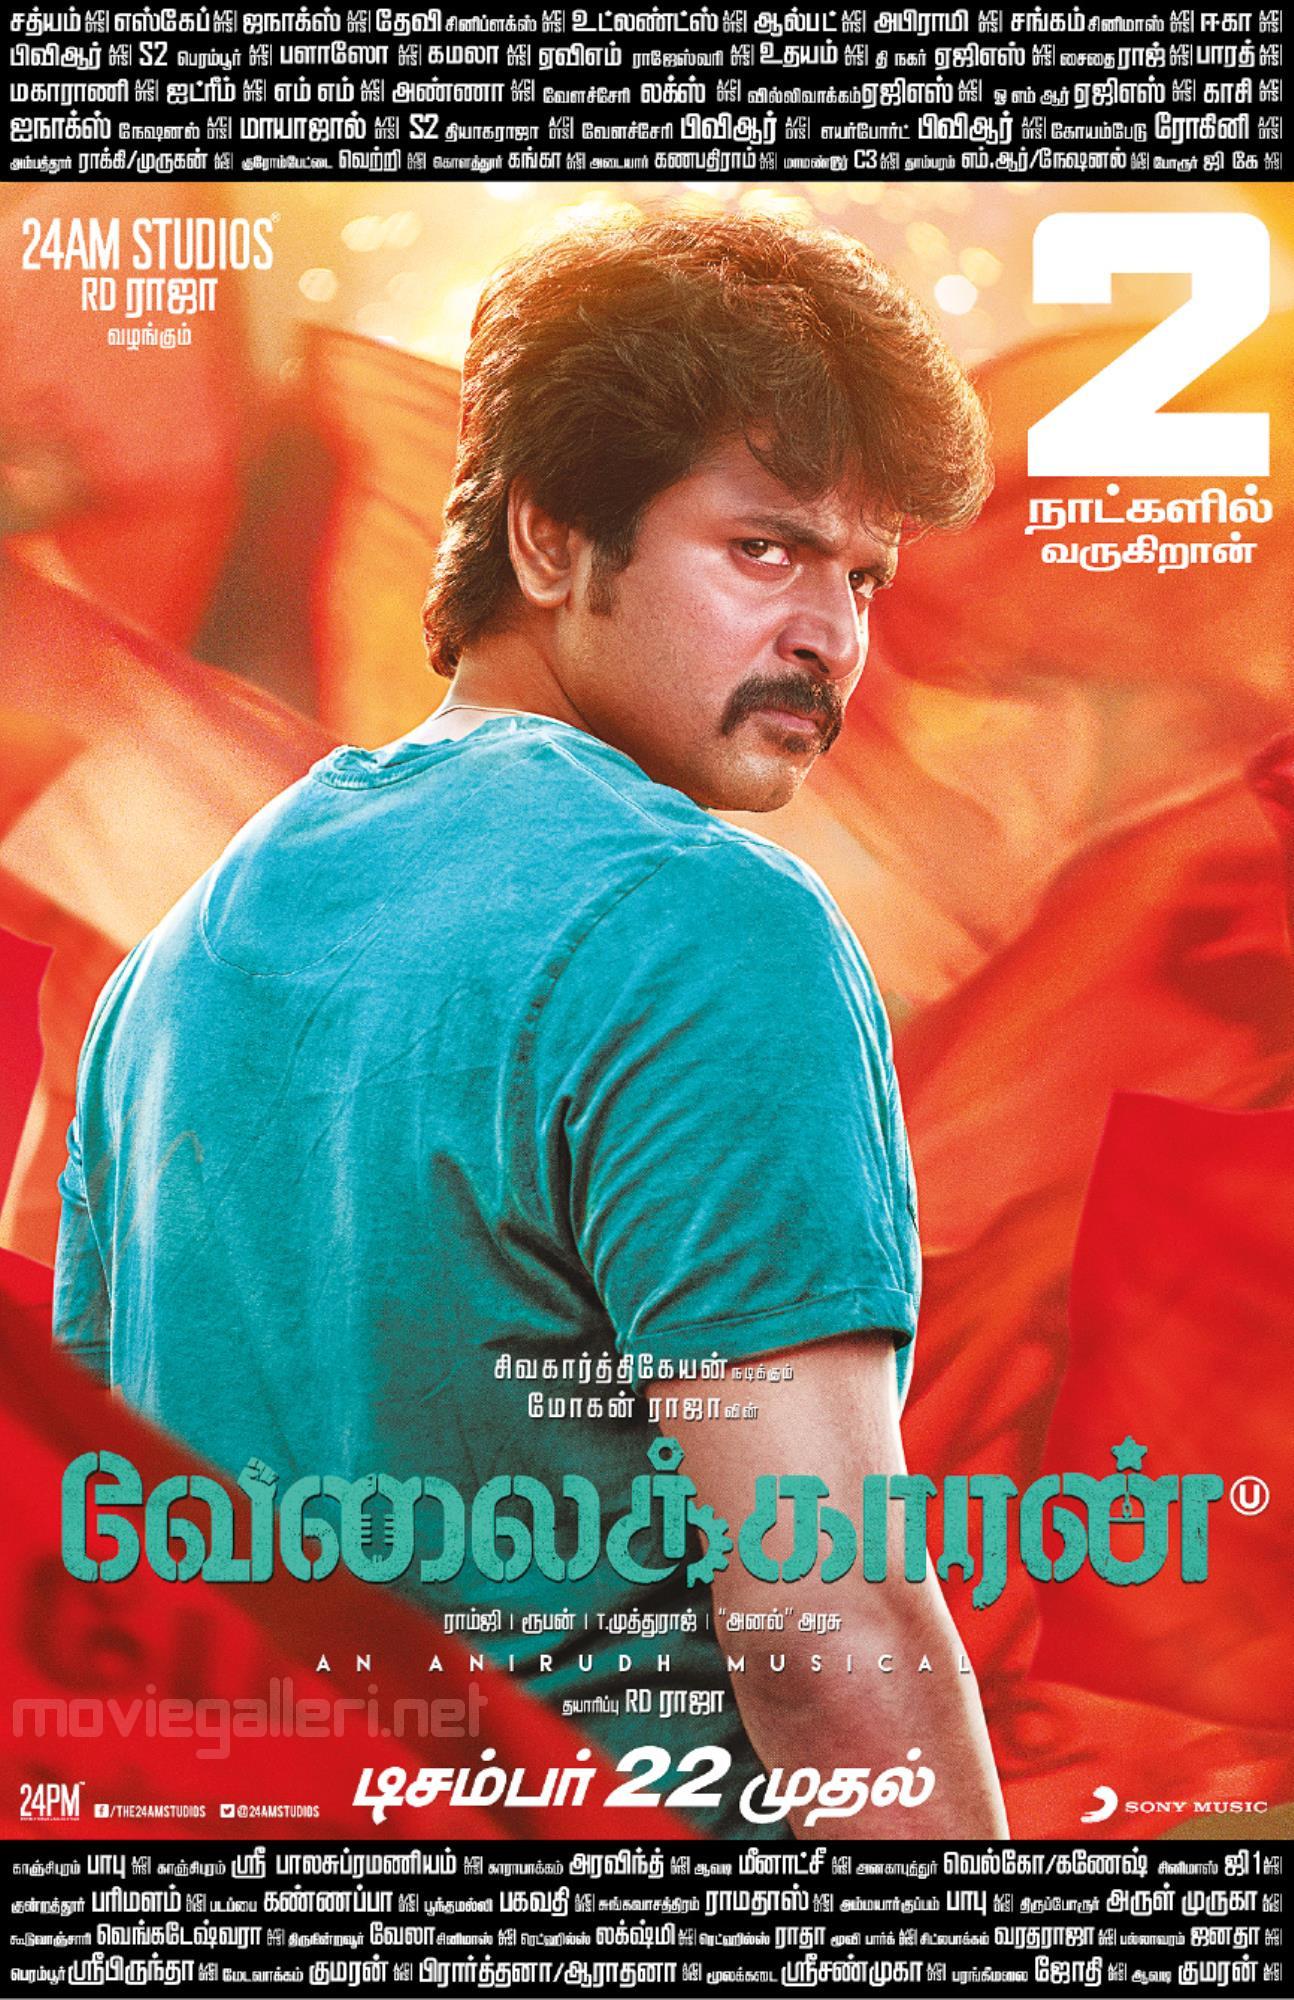 Sivakarthikeyan Velaikaran 2 days to go Posters